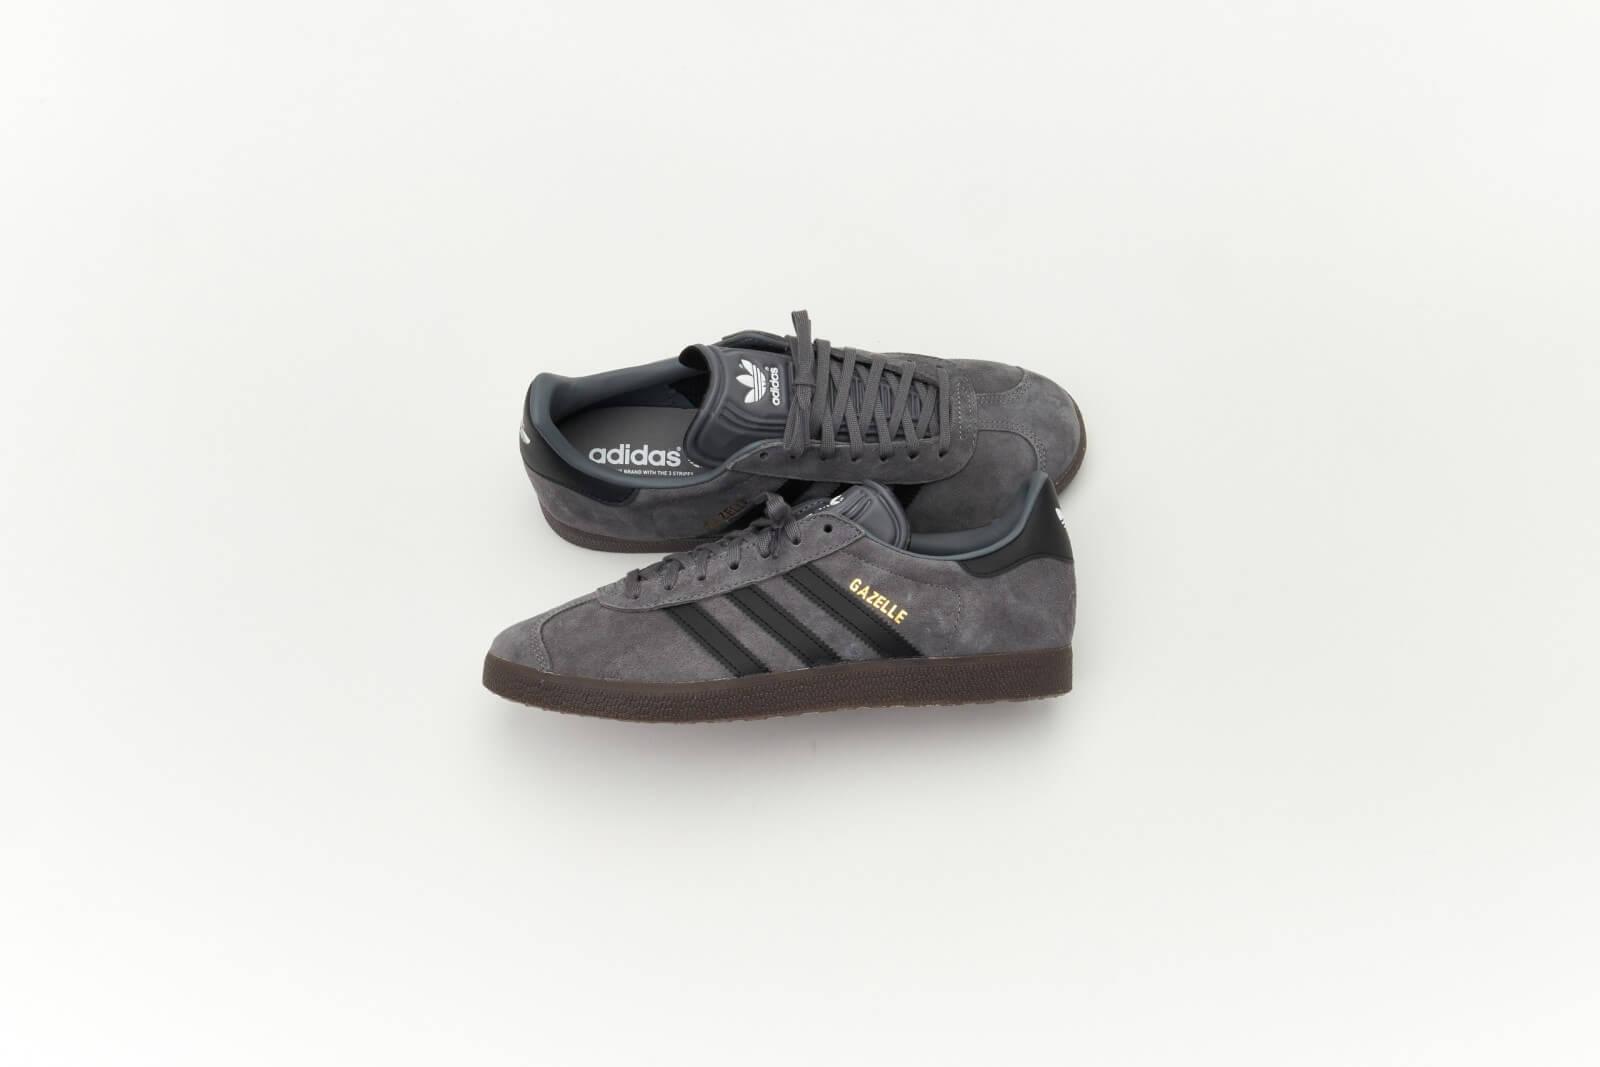 Adidas Gazelle Grey Four/Core Black-Gum5